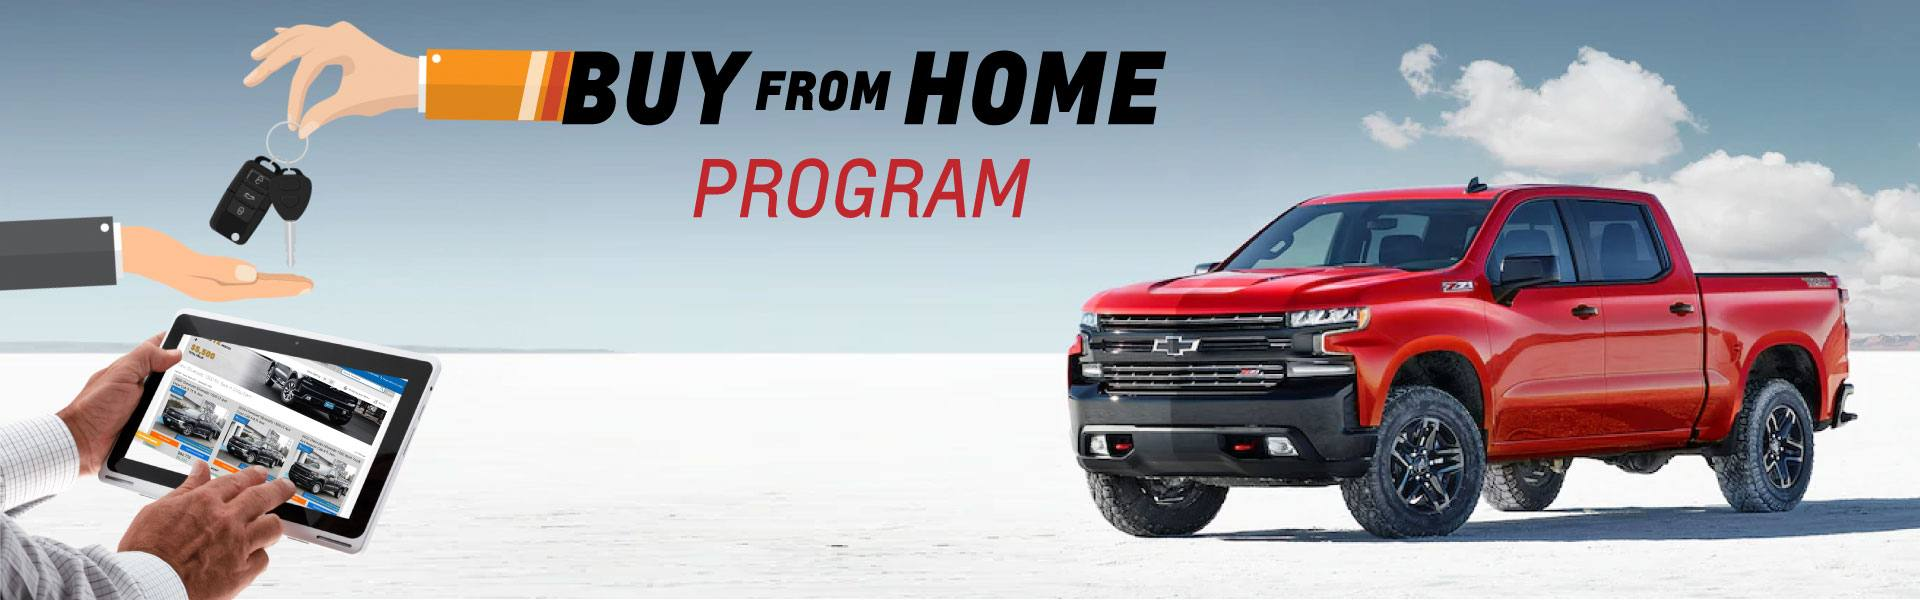 buy from home program